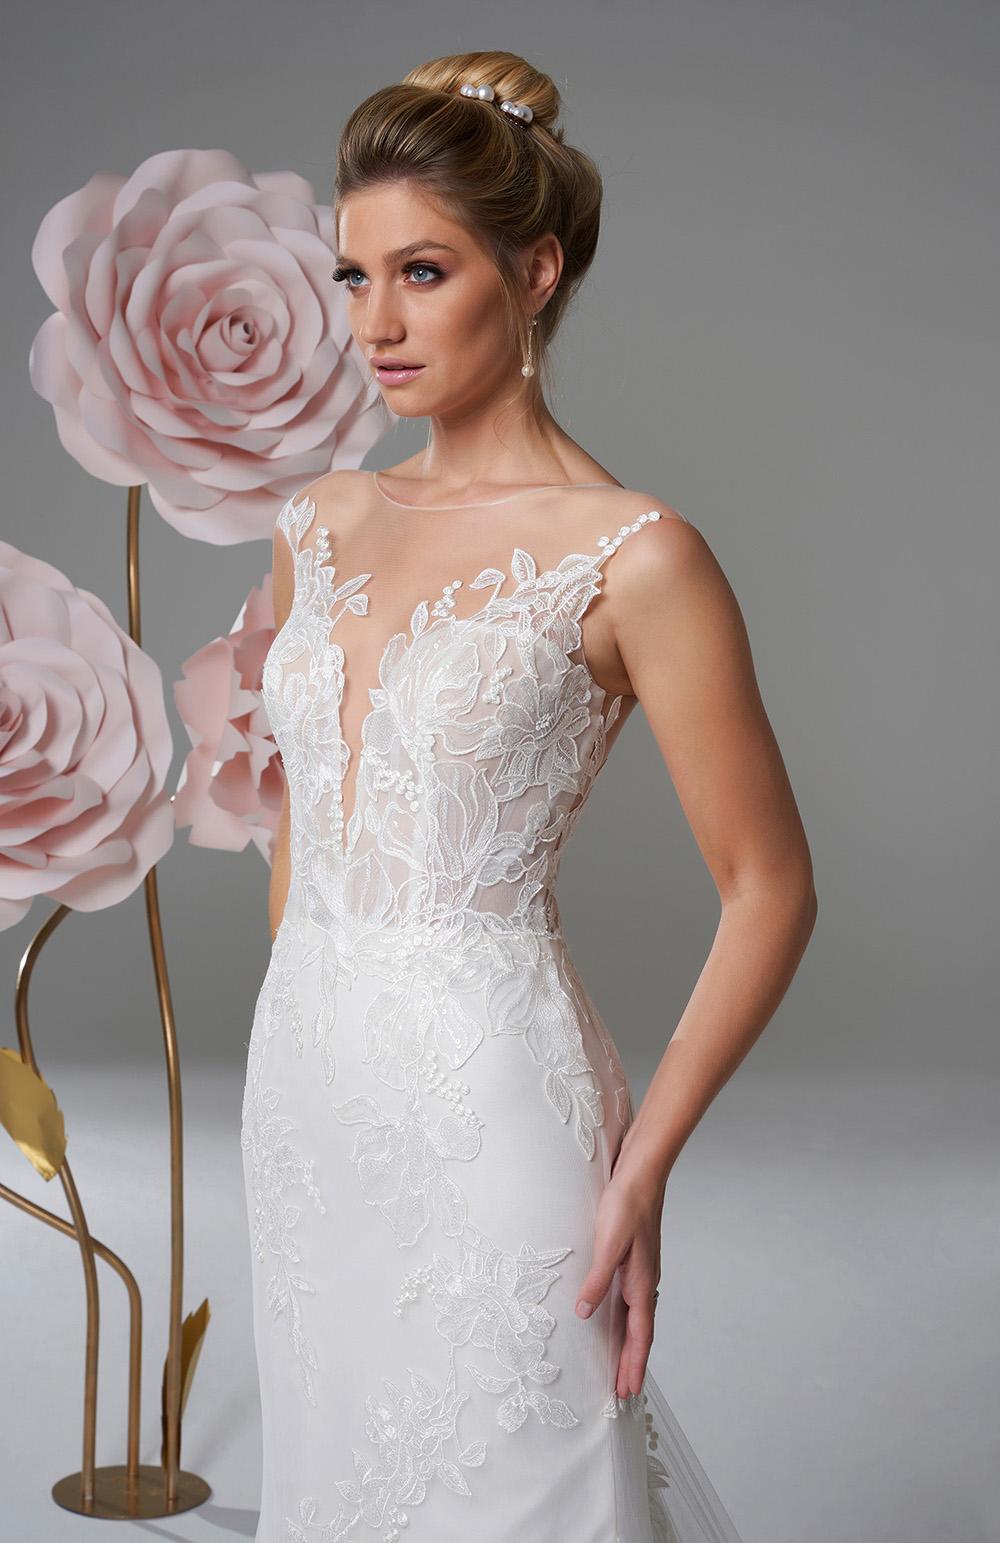 Robes de mariée Rose Angel 2022